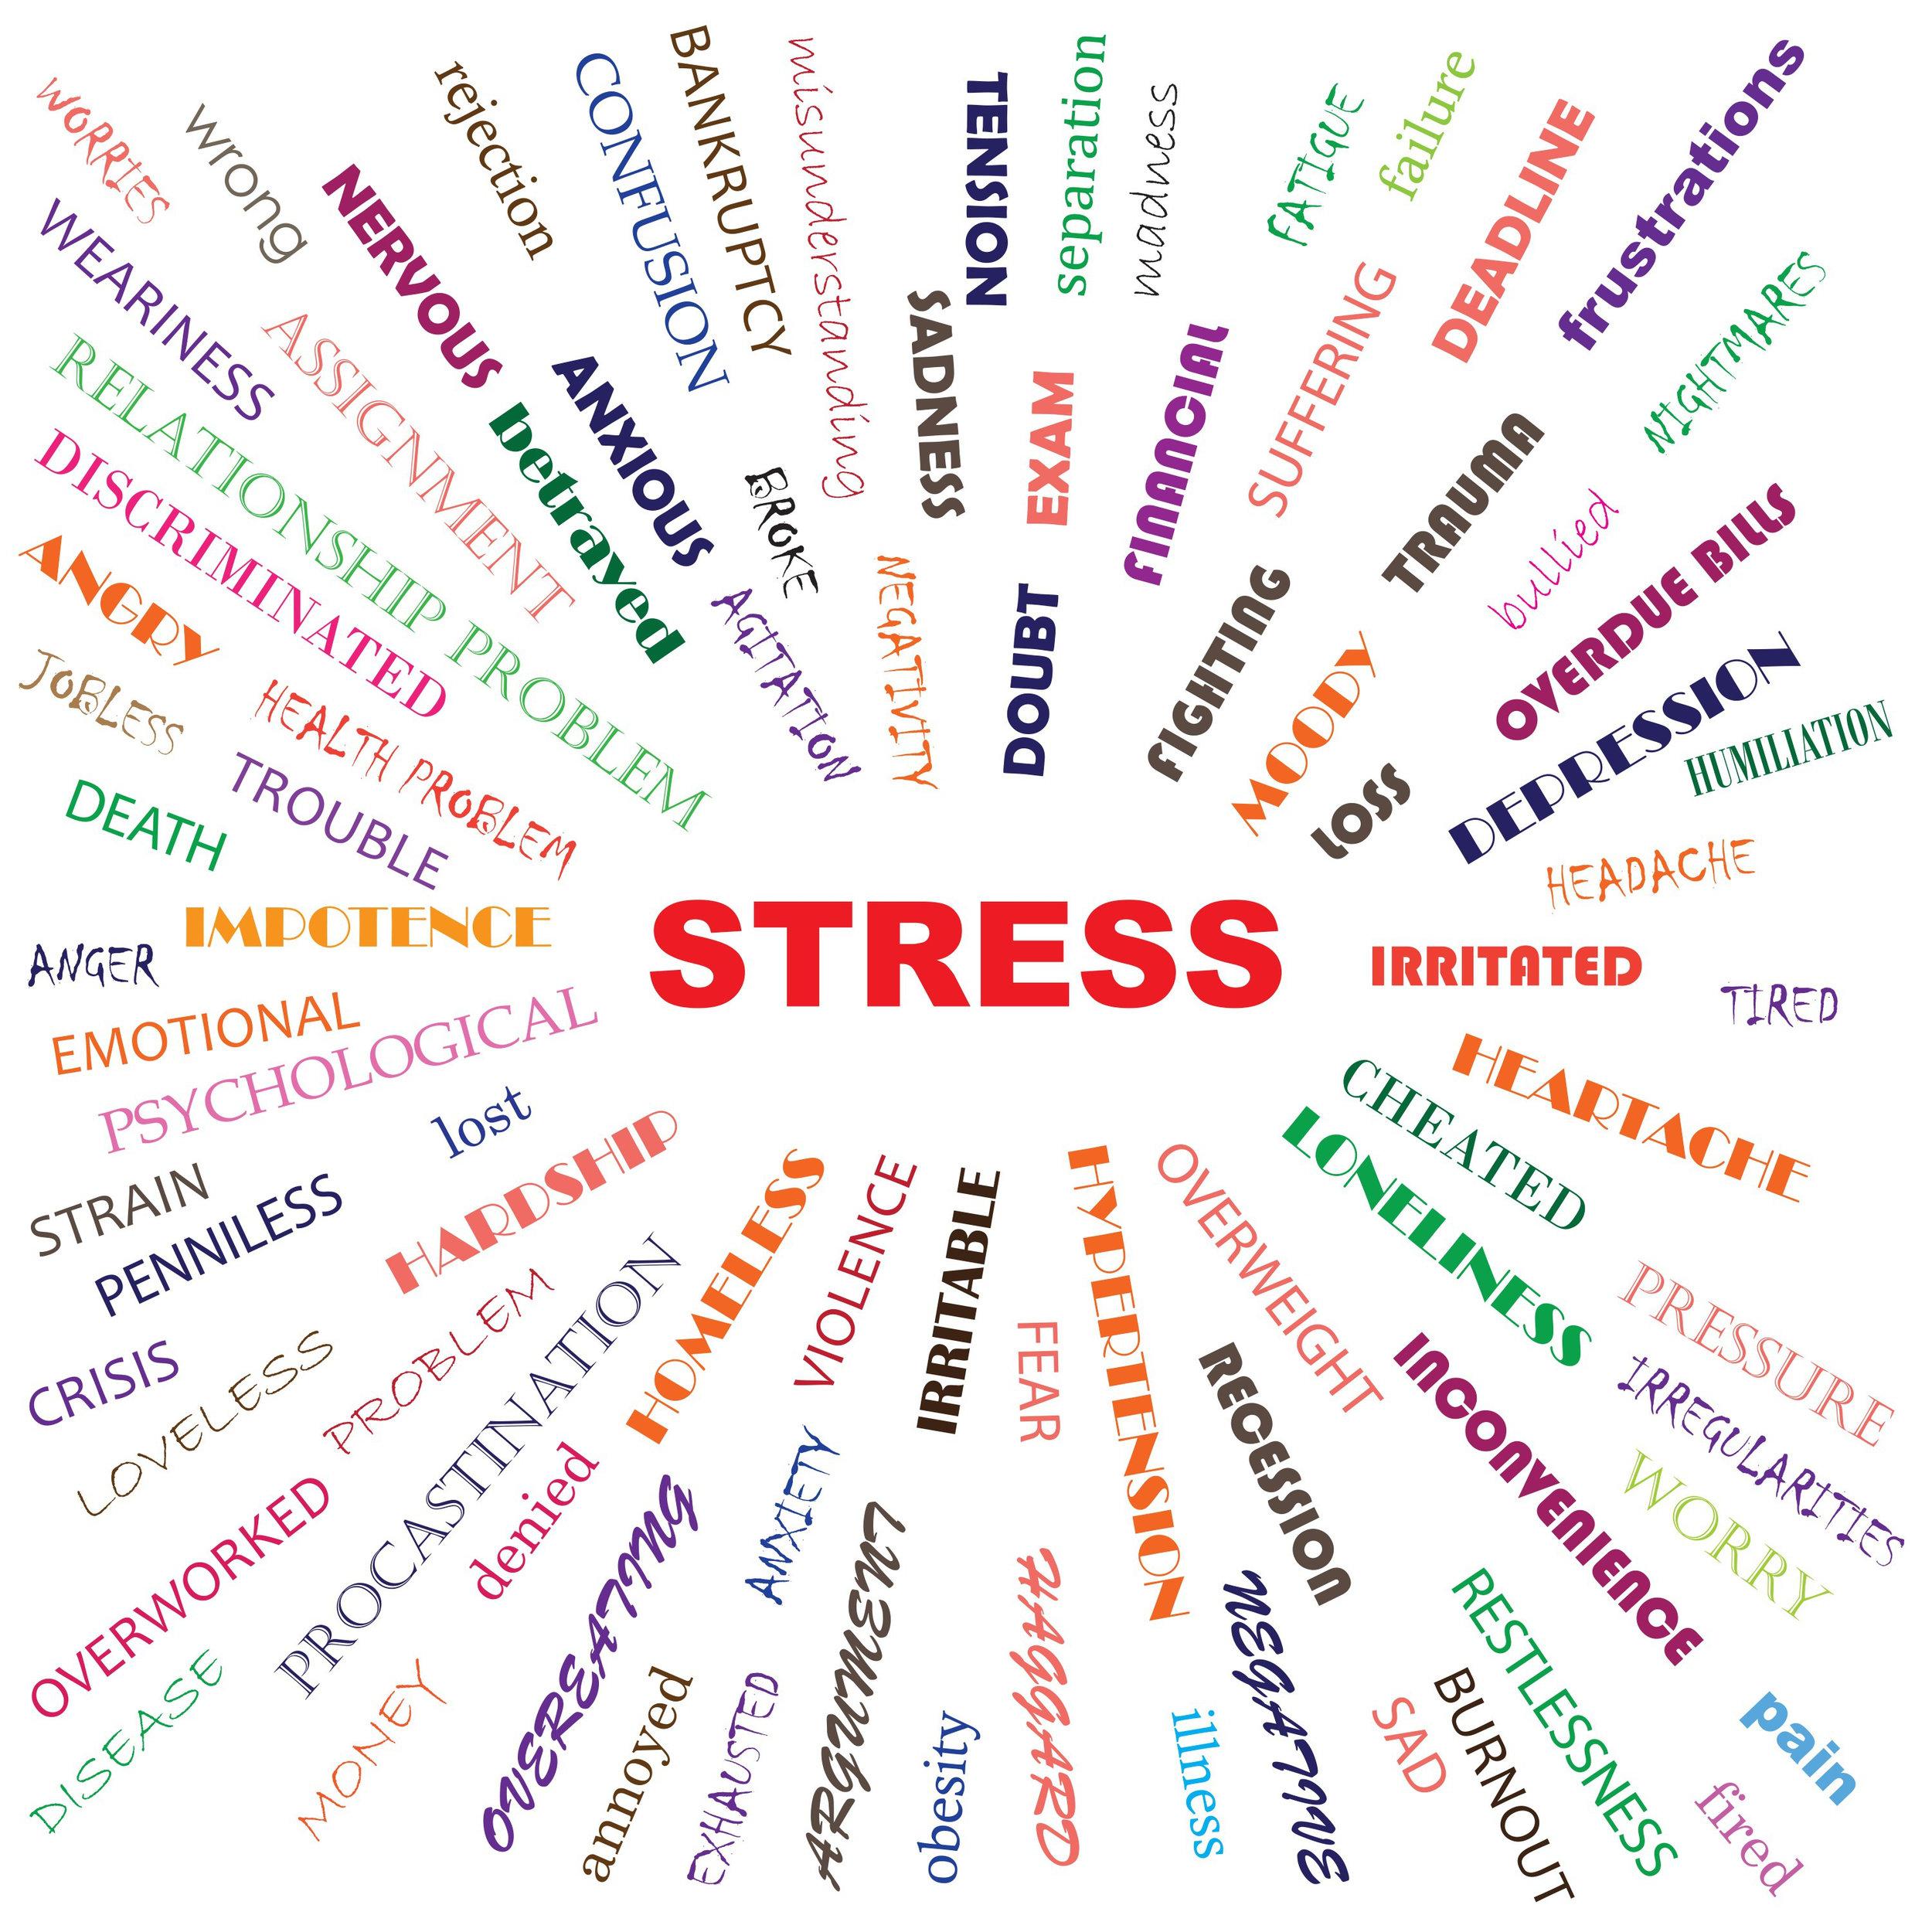 stress_fyGzwkwO_L.jpg